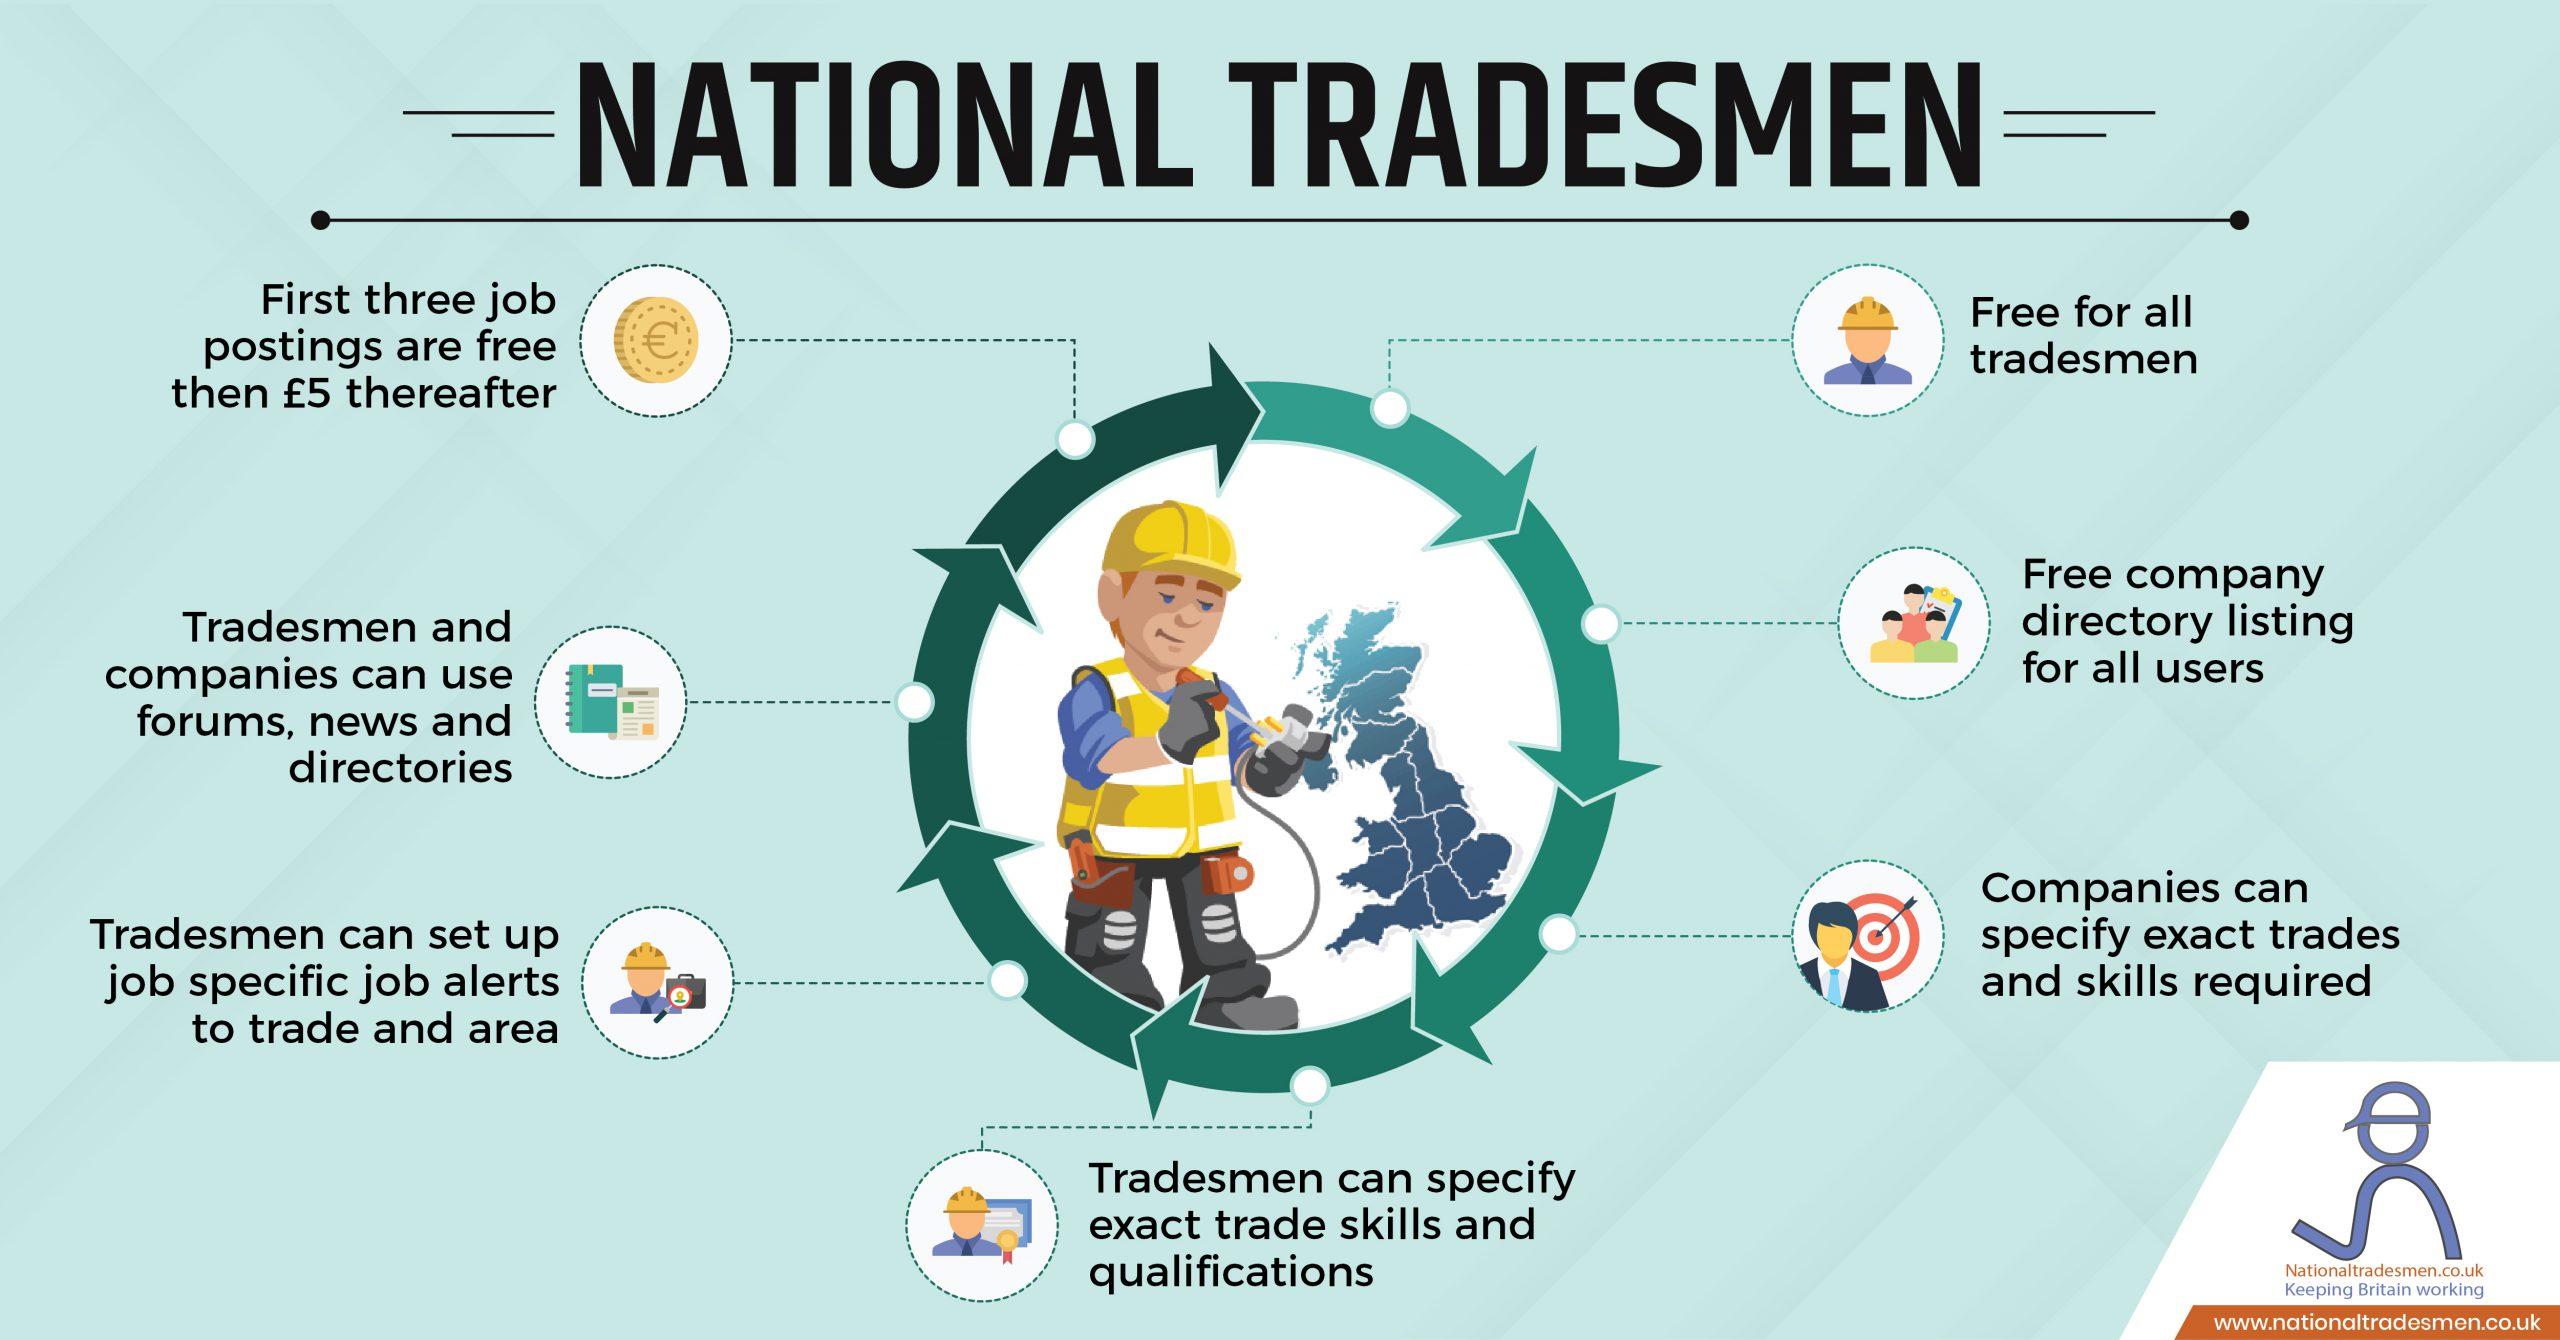 Nationaltradesmen infographic